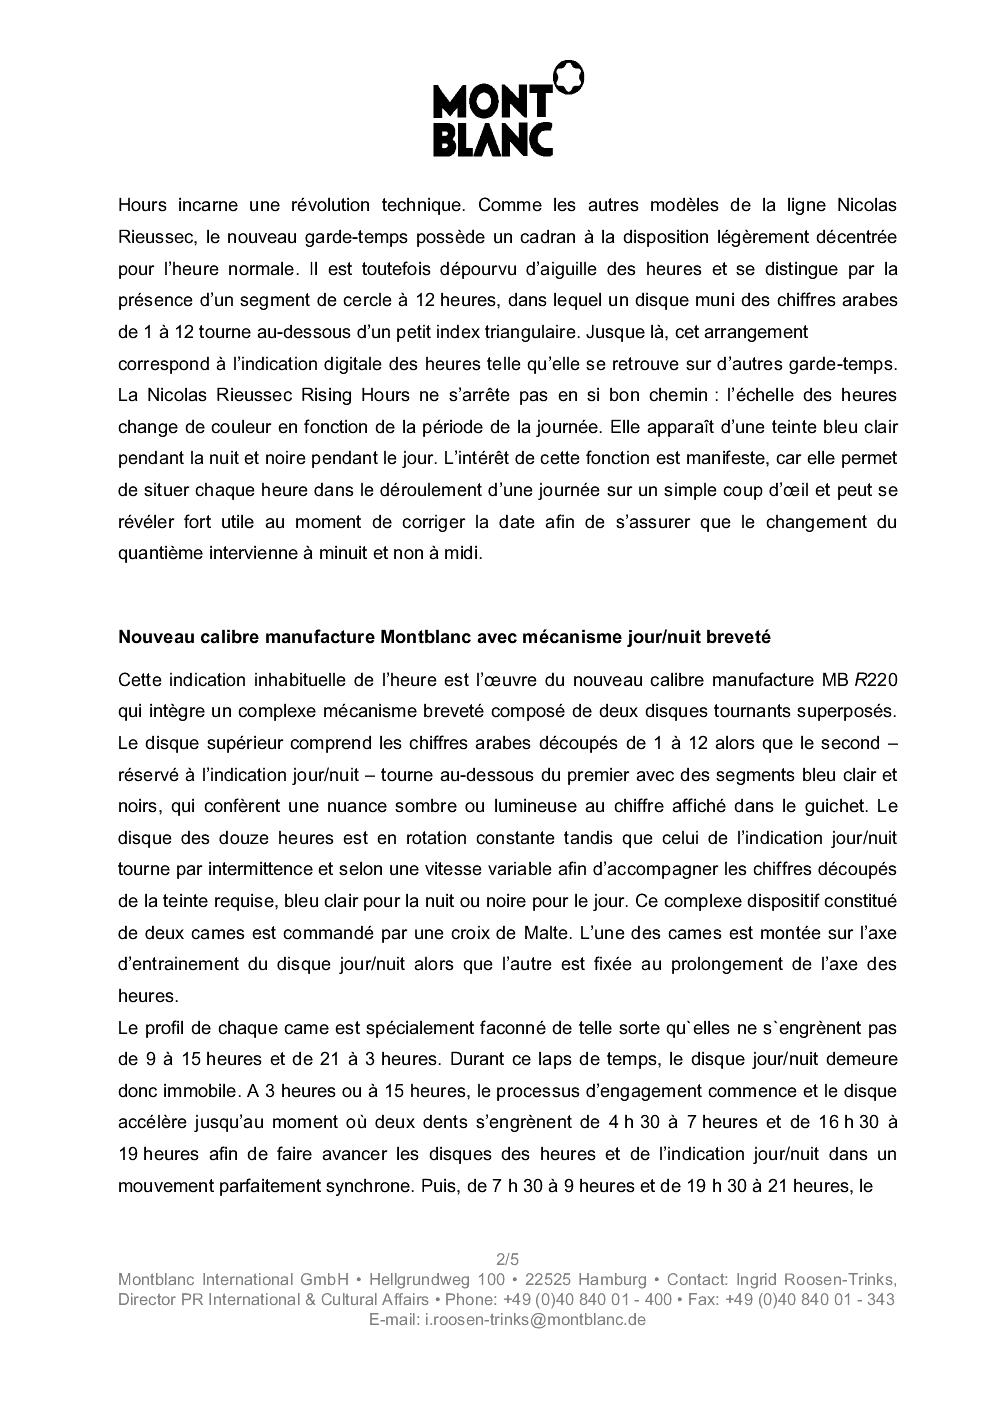 SIHH 2013 MONTBLANC Nicolas RIEUSSEC Rising Hours 2zxmhzm